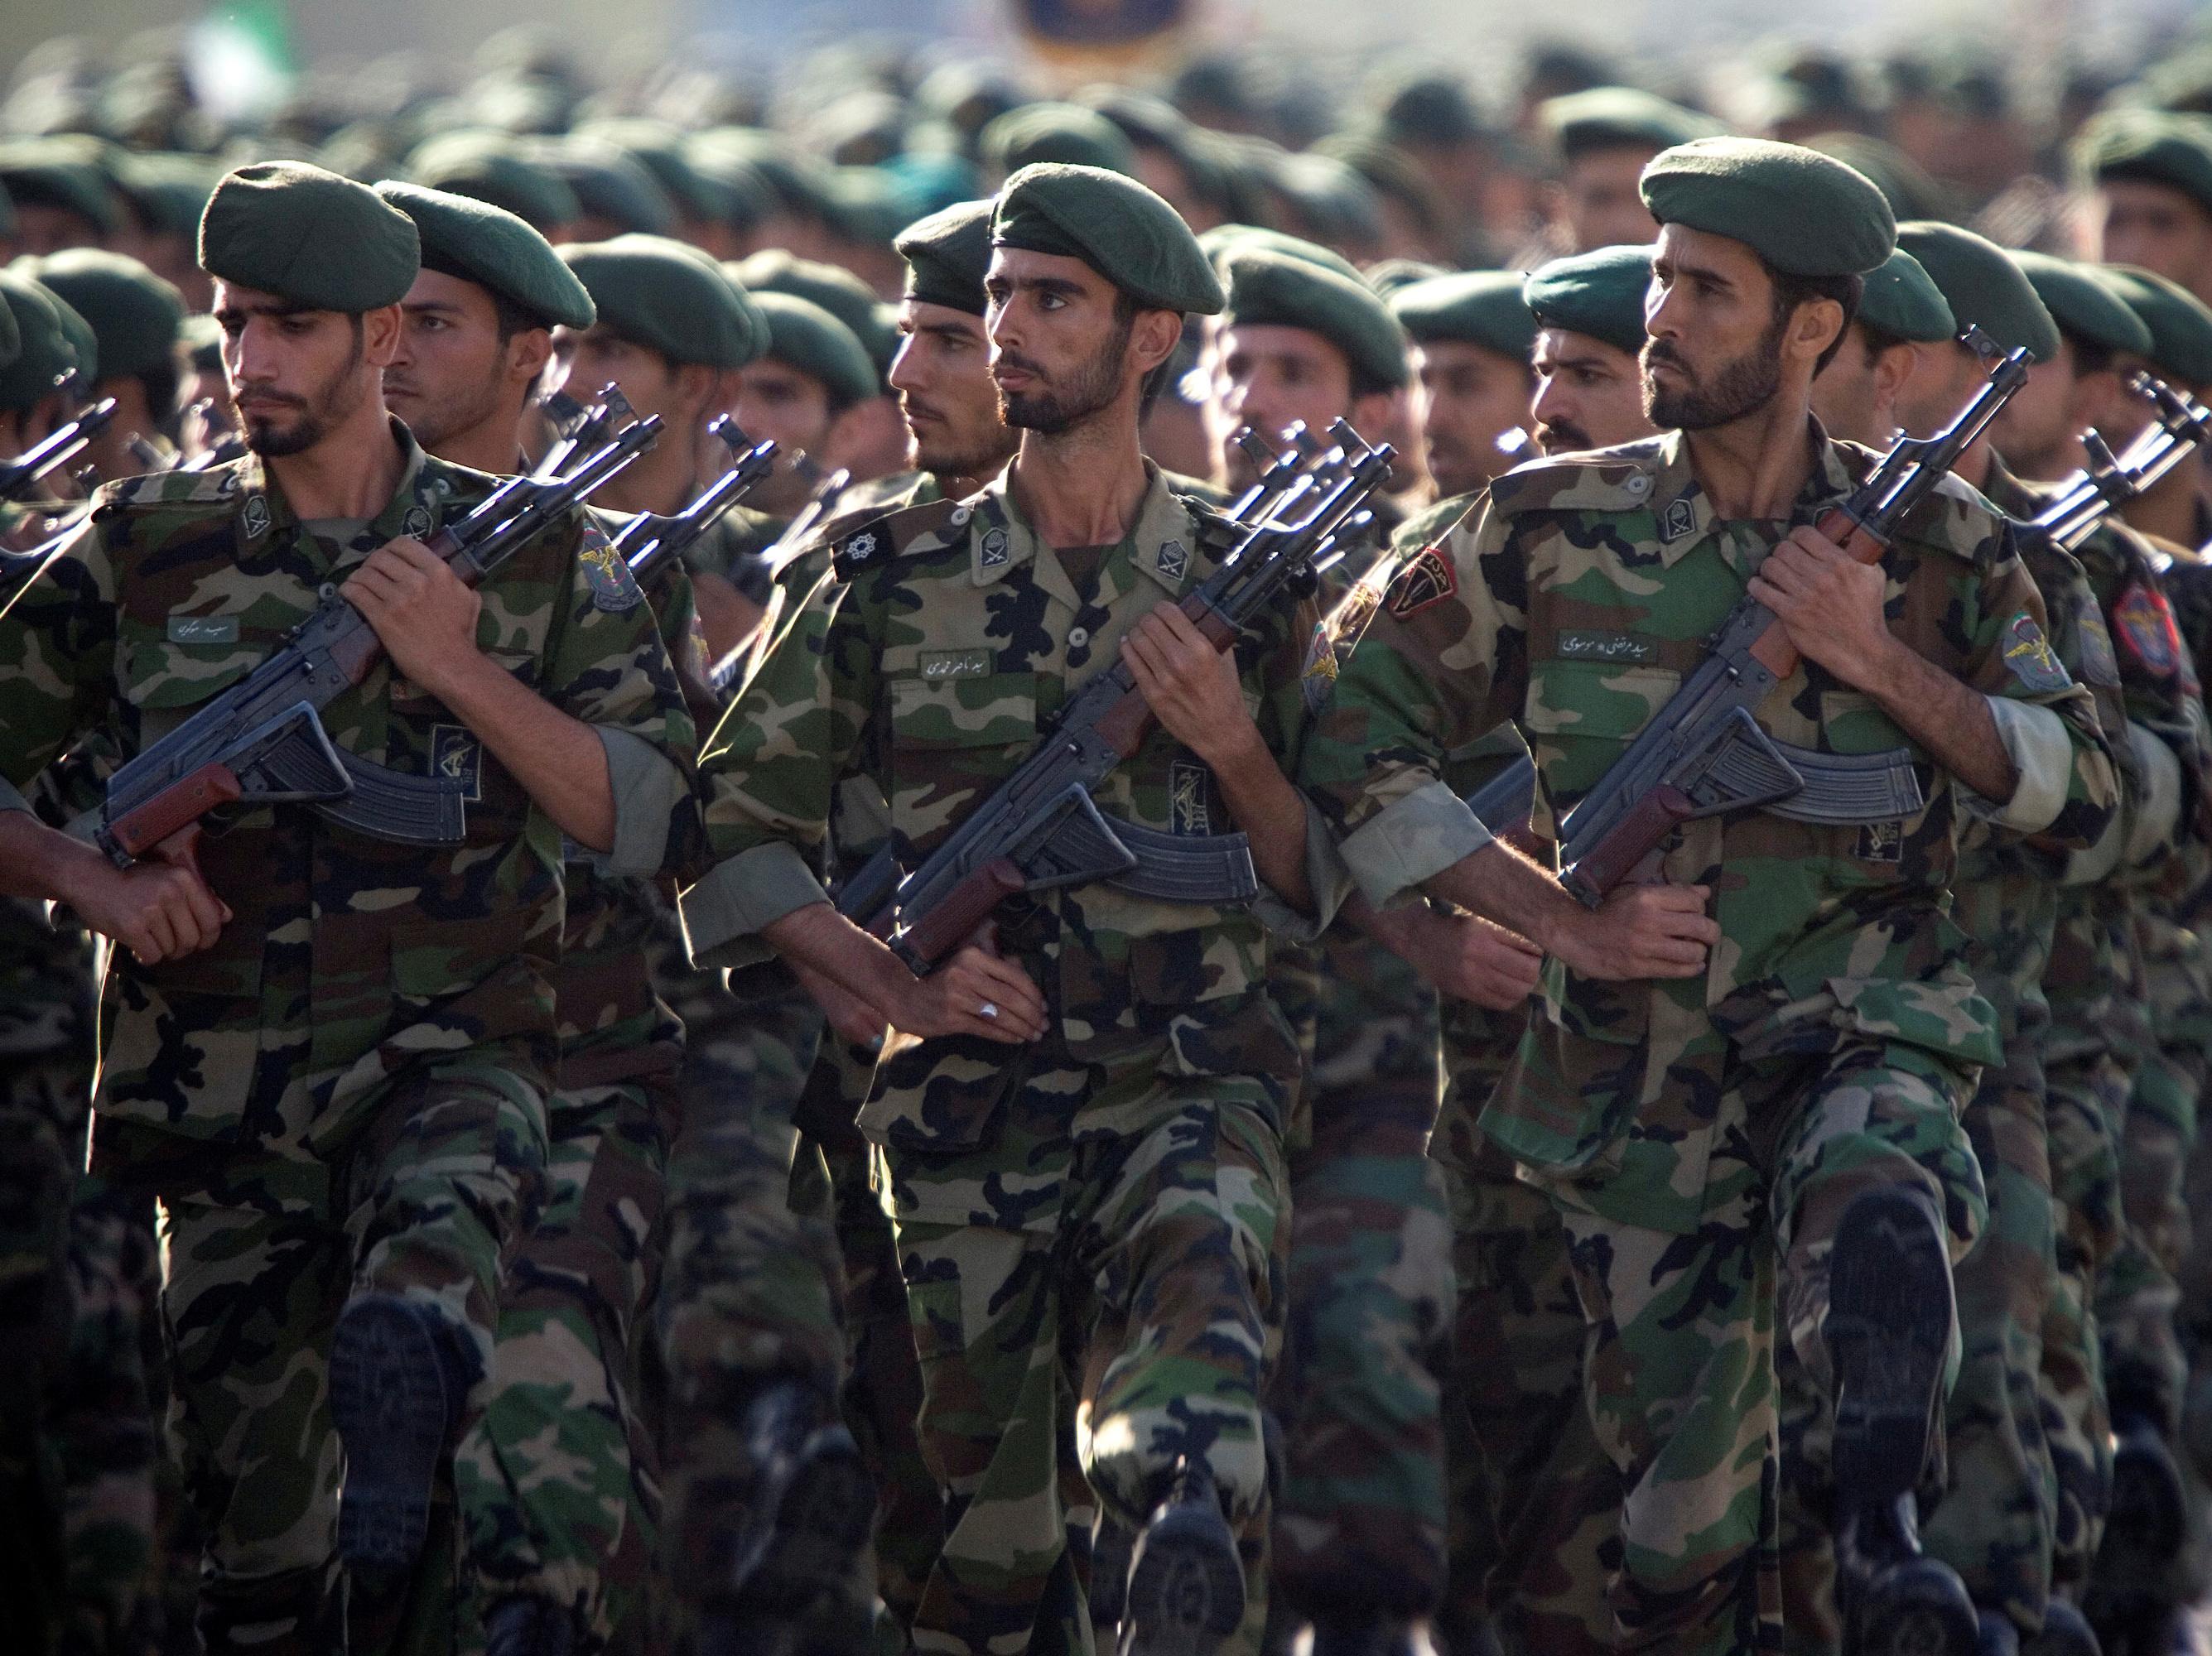 U.S. Labels Iran's Revolutionary Guard As A Foreign Terrorist Organization